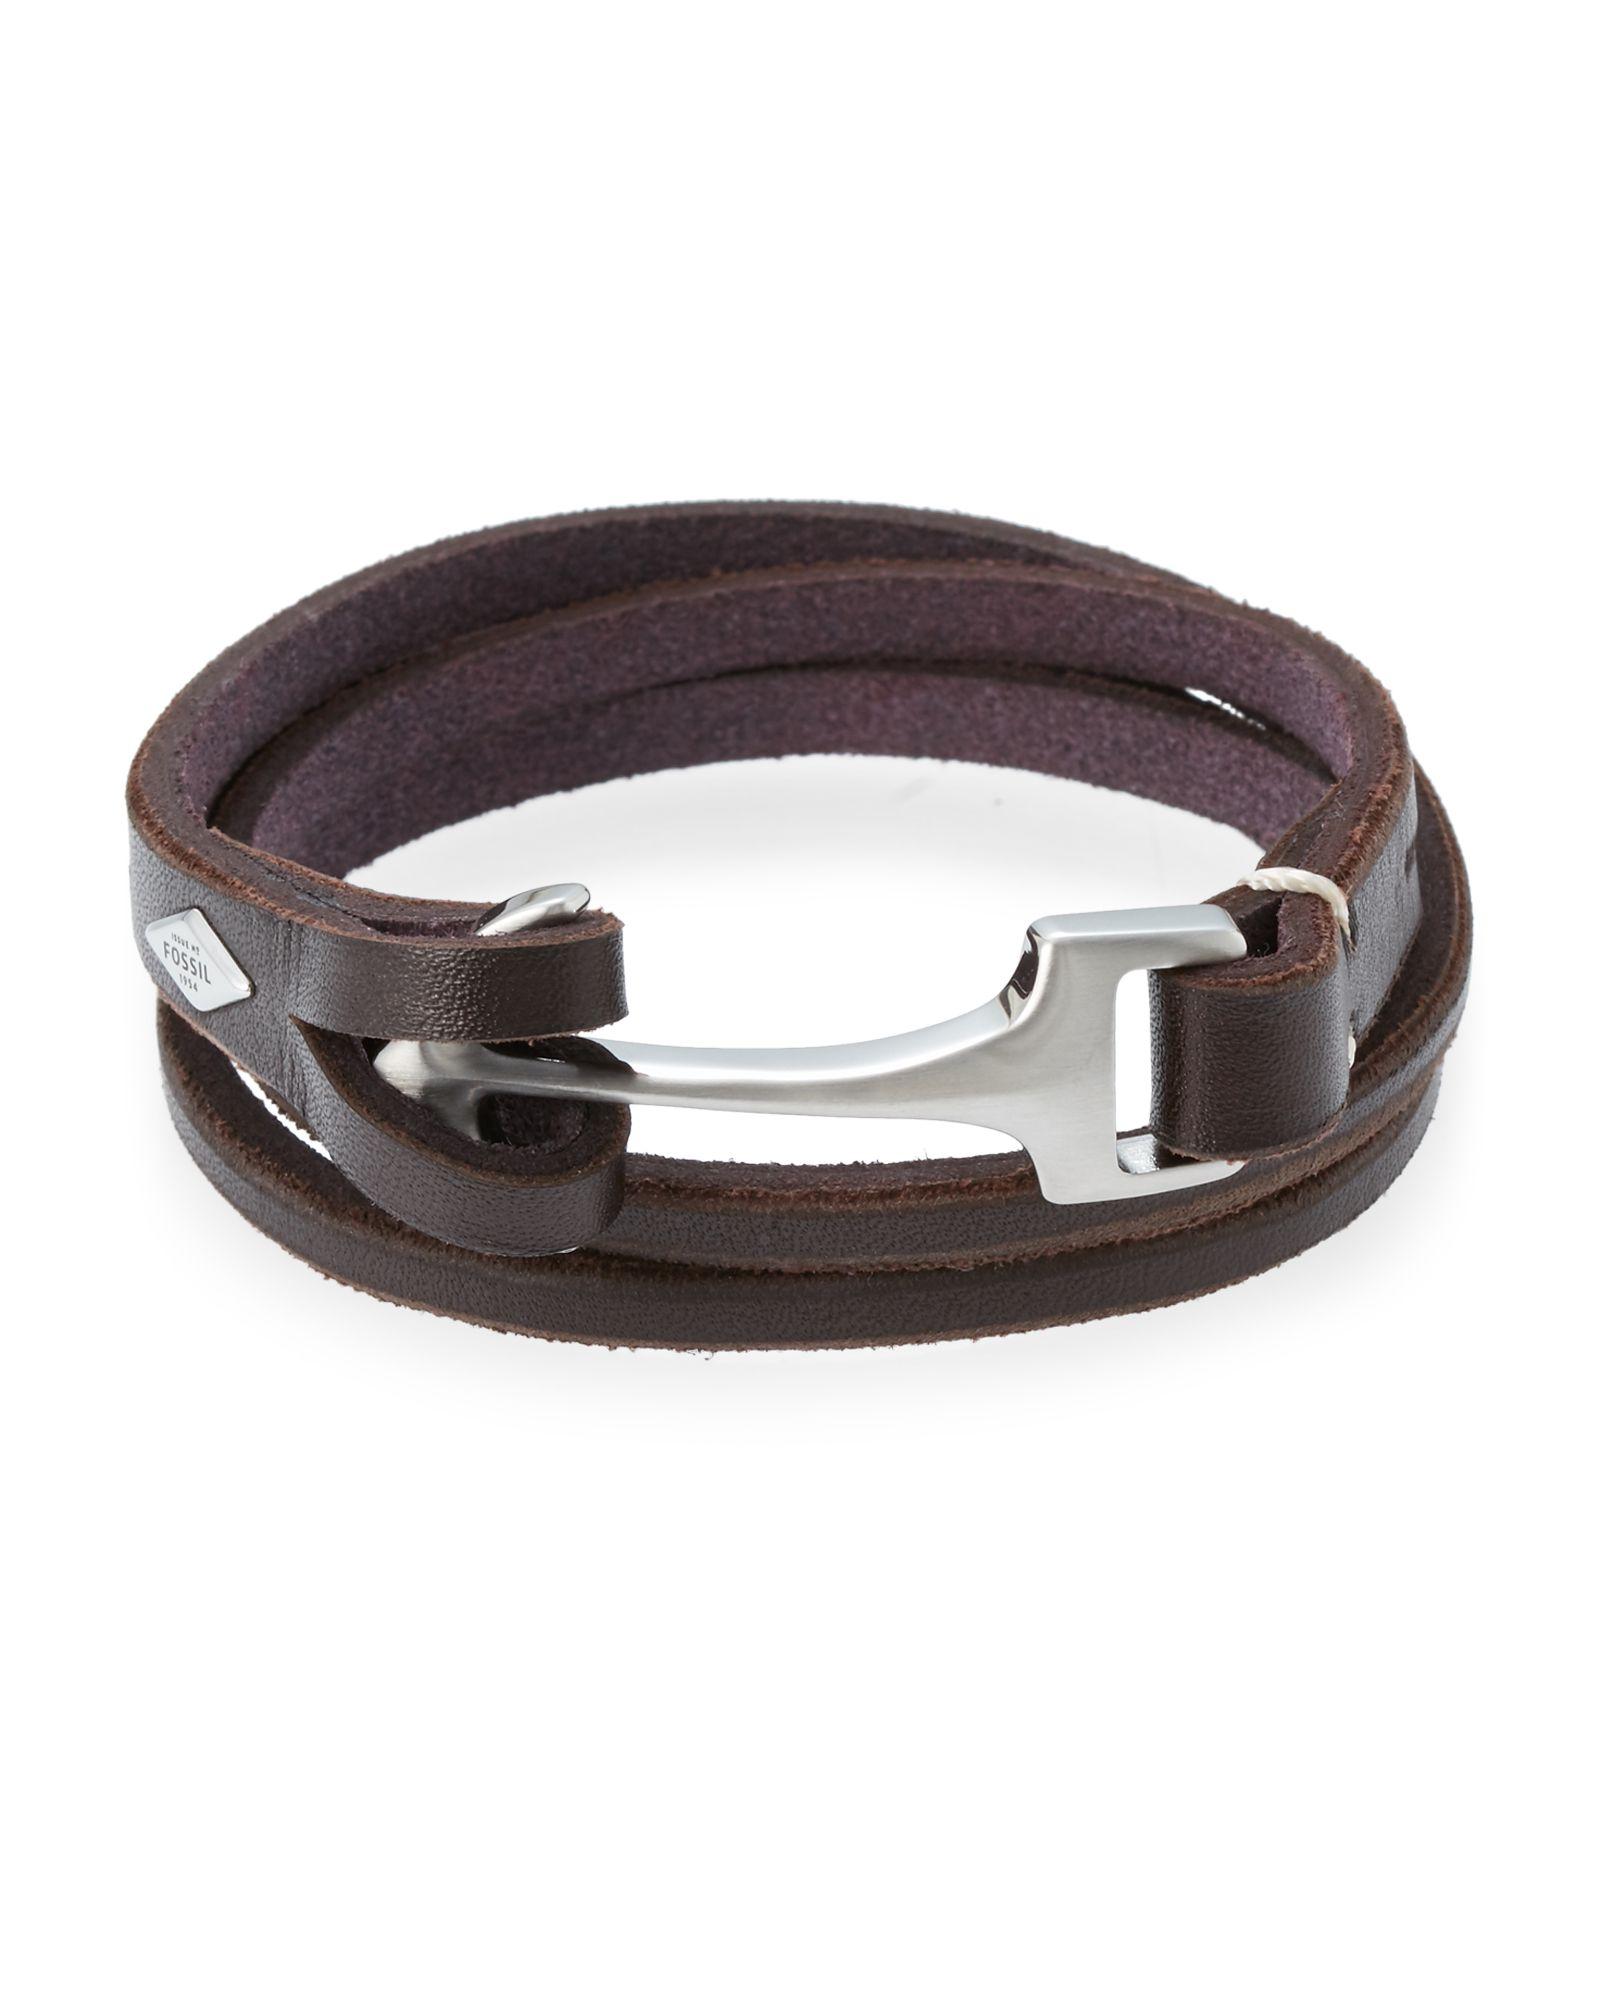 1da252bfff48bc Brown Anchor Bracelet | *Apparel & Accessories* | Bracelets, Anchor ...